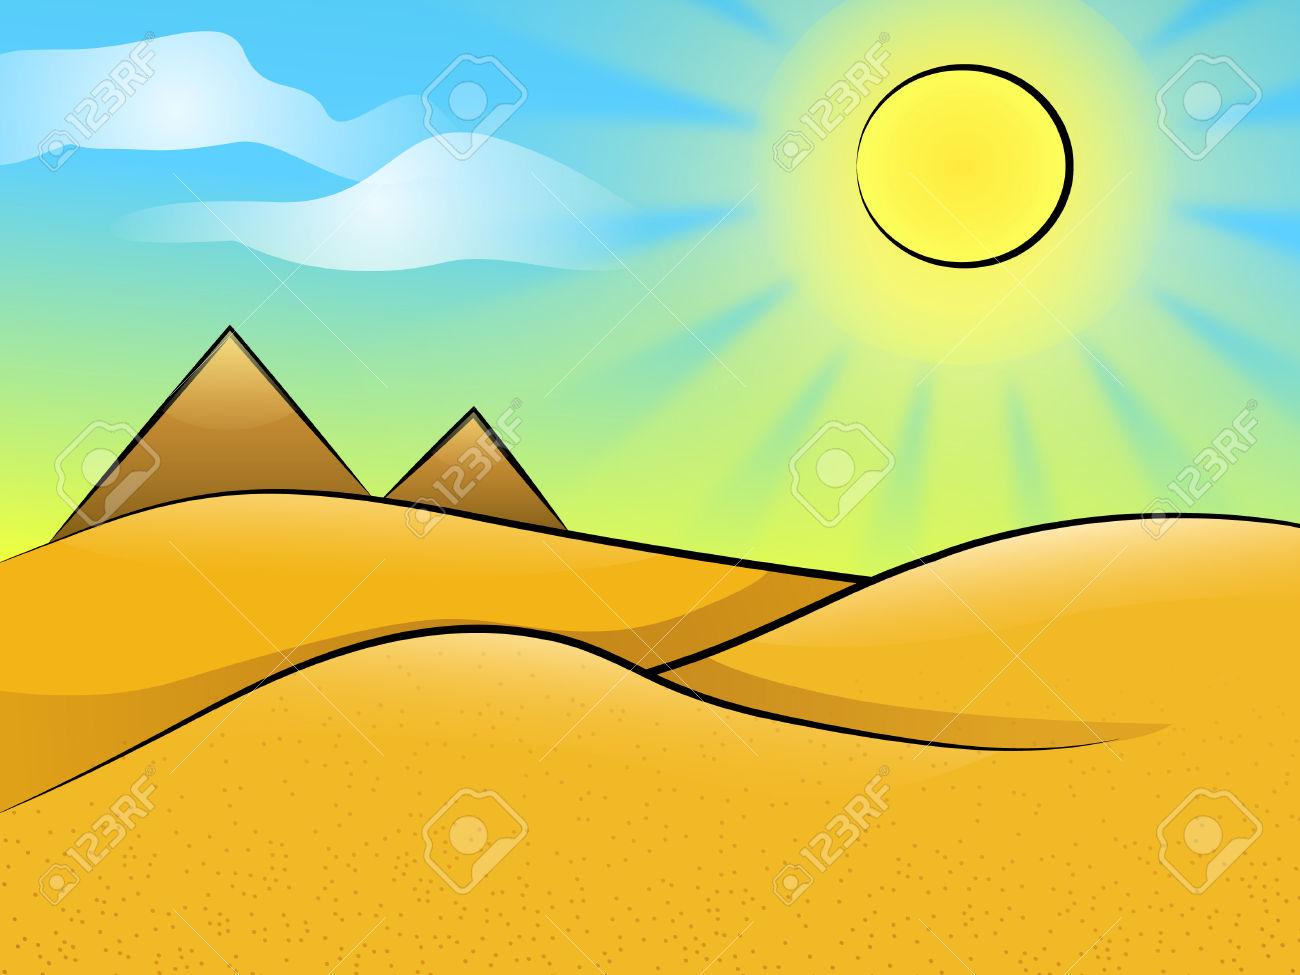 Free Desert Cliparts, Download Free Clip Art, Free Clip Art.